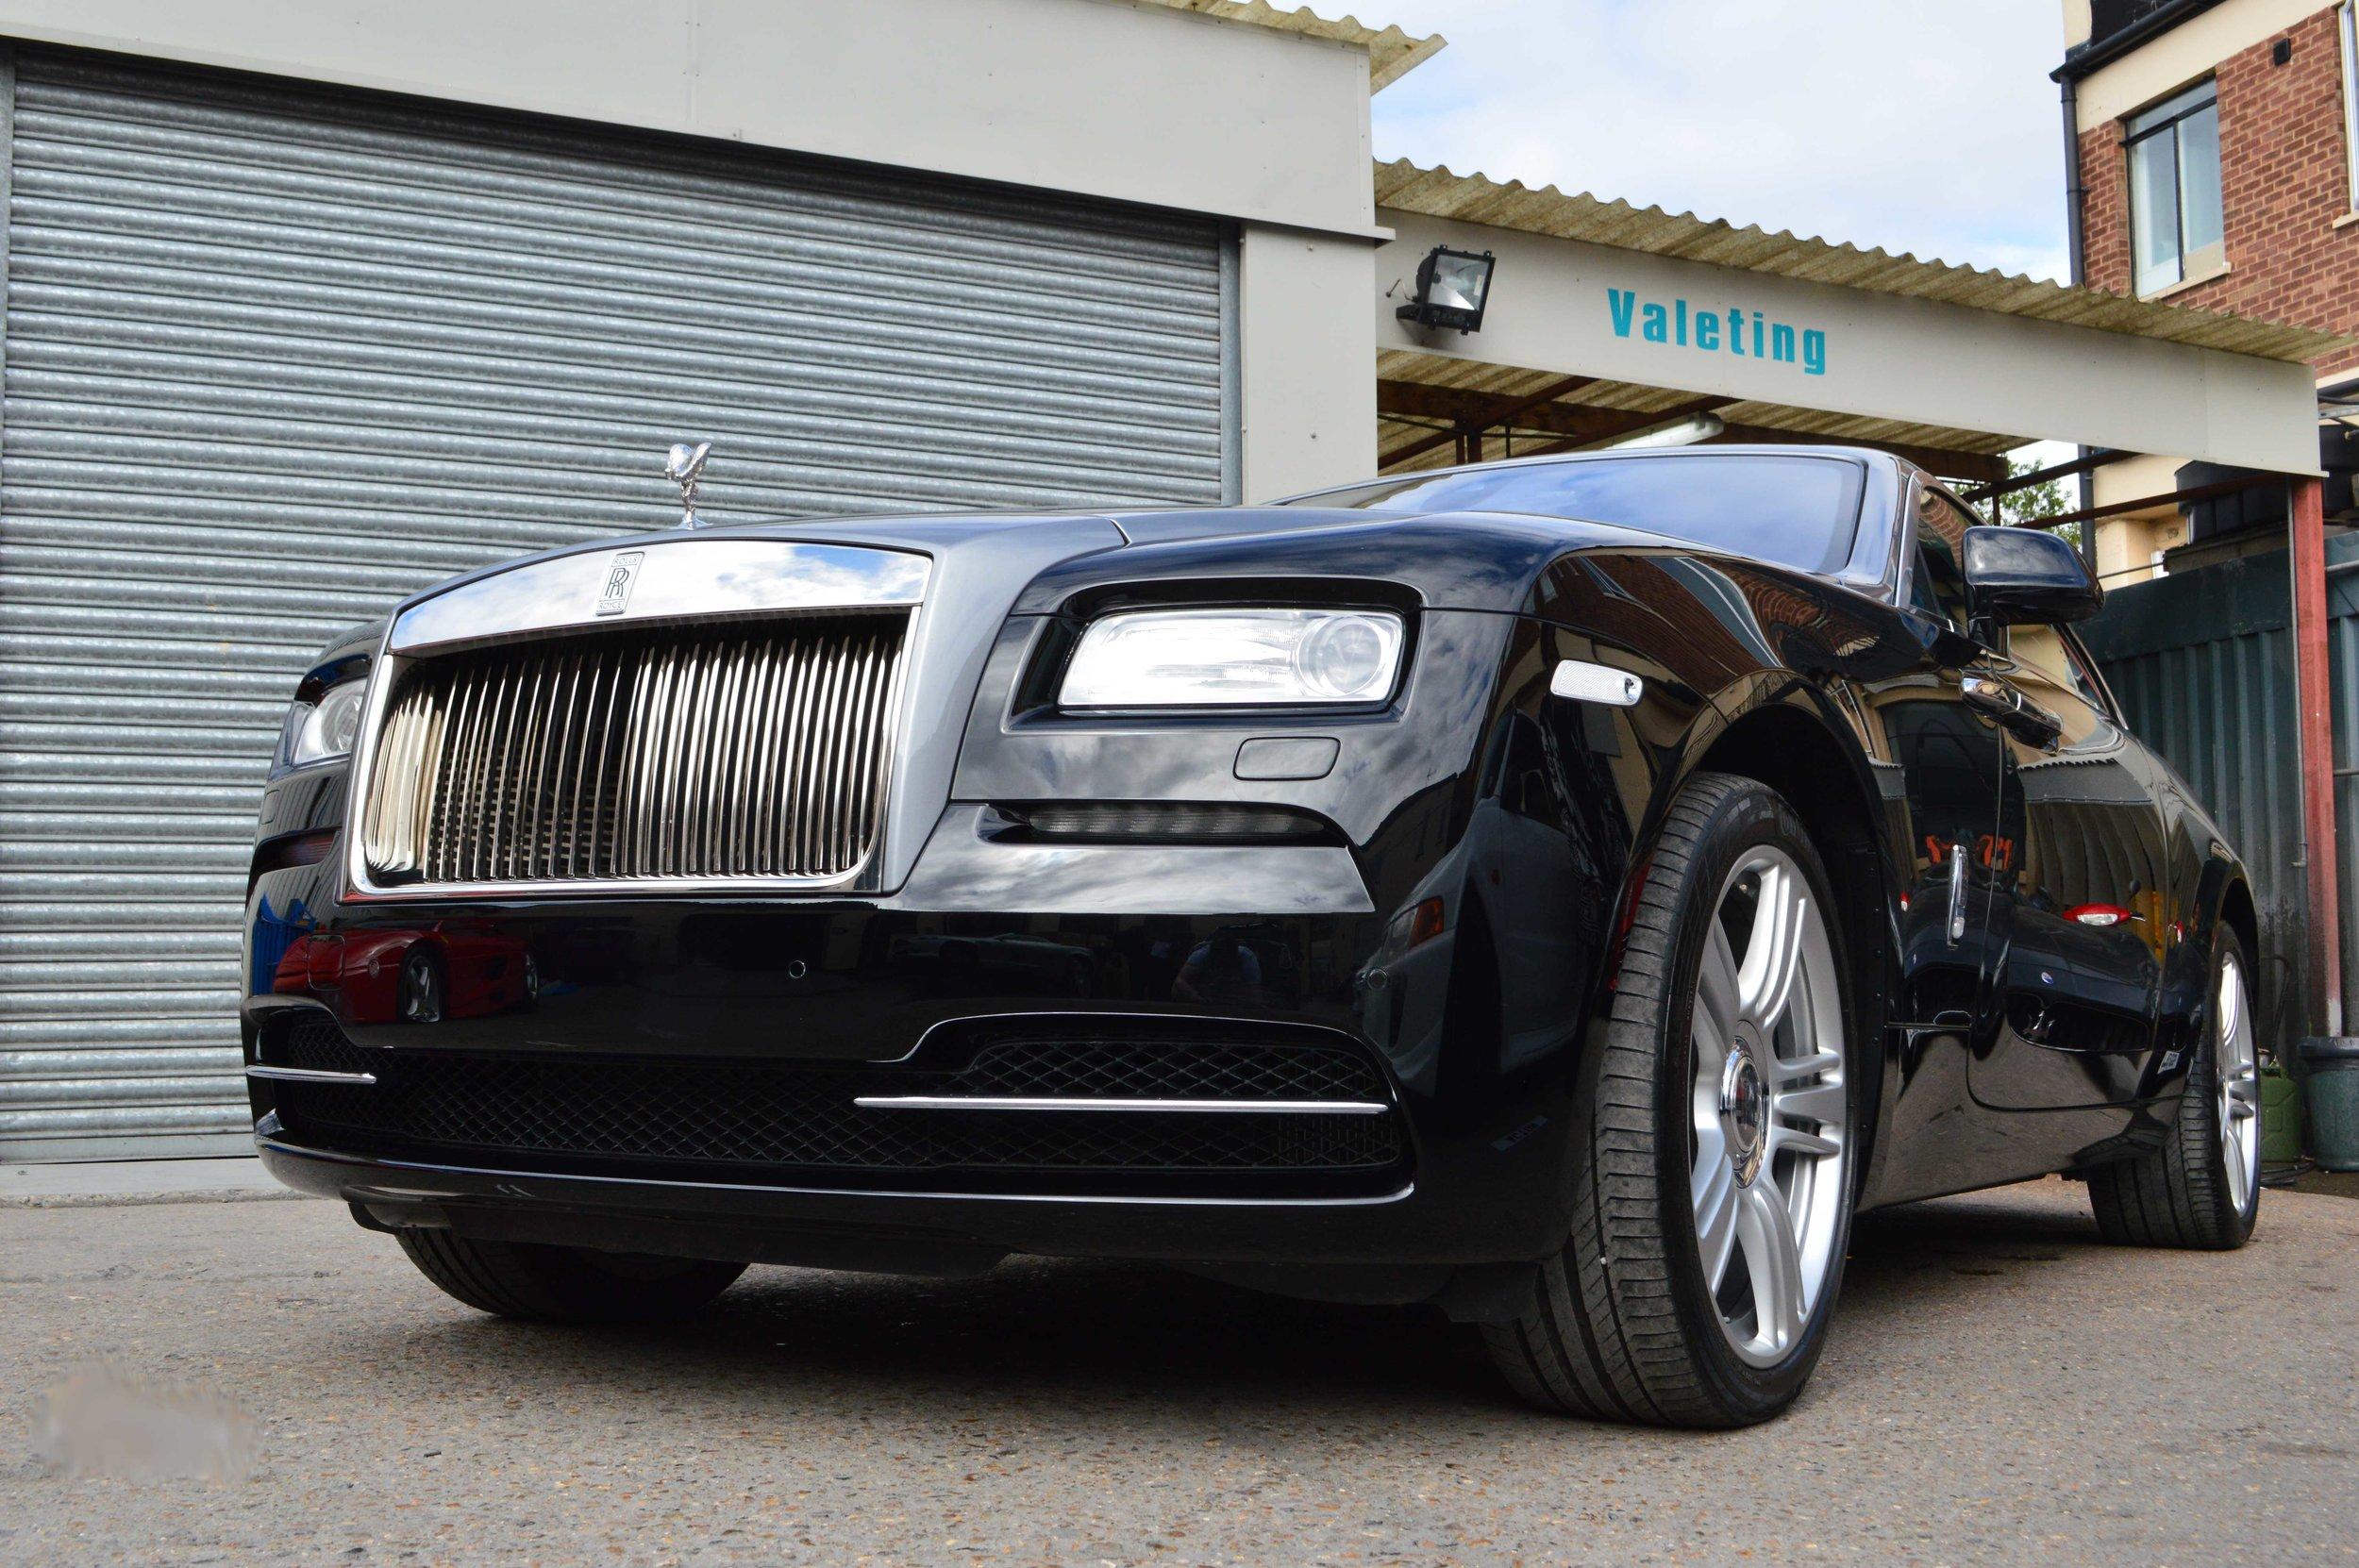 Rolls Royce bodyshop